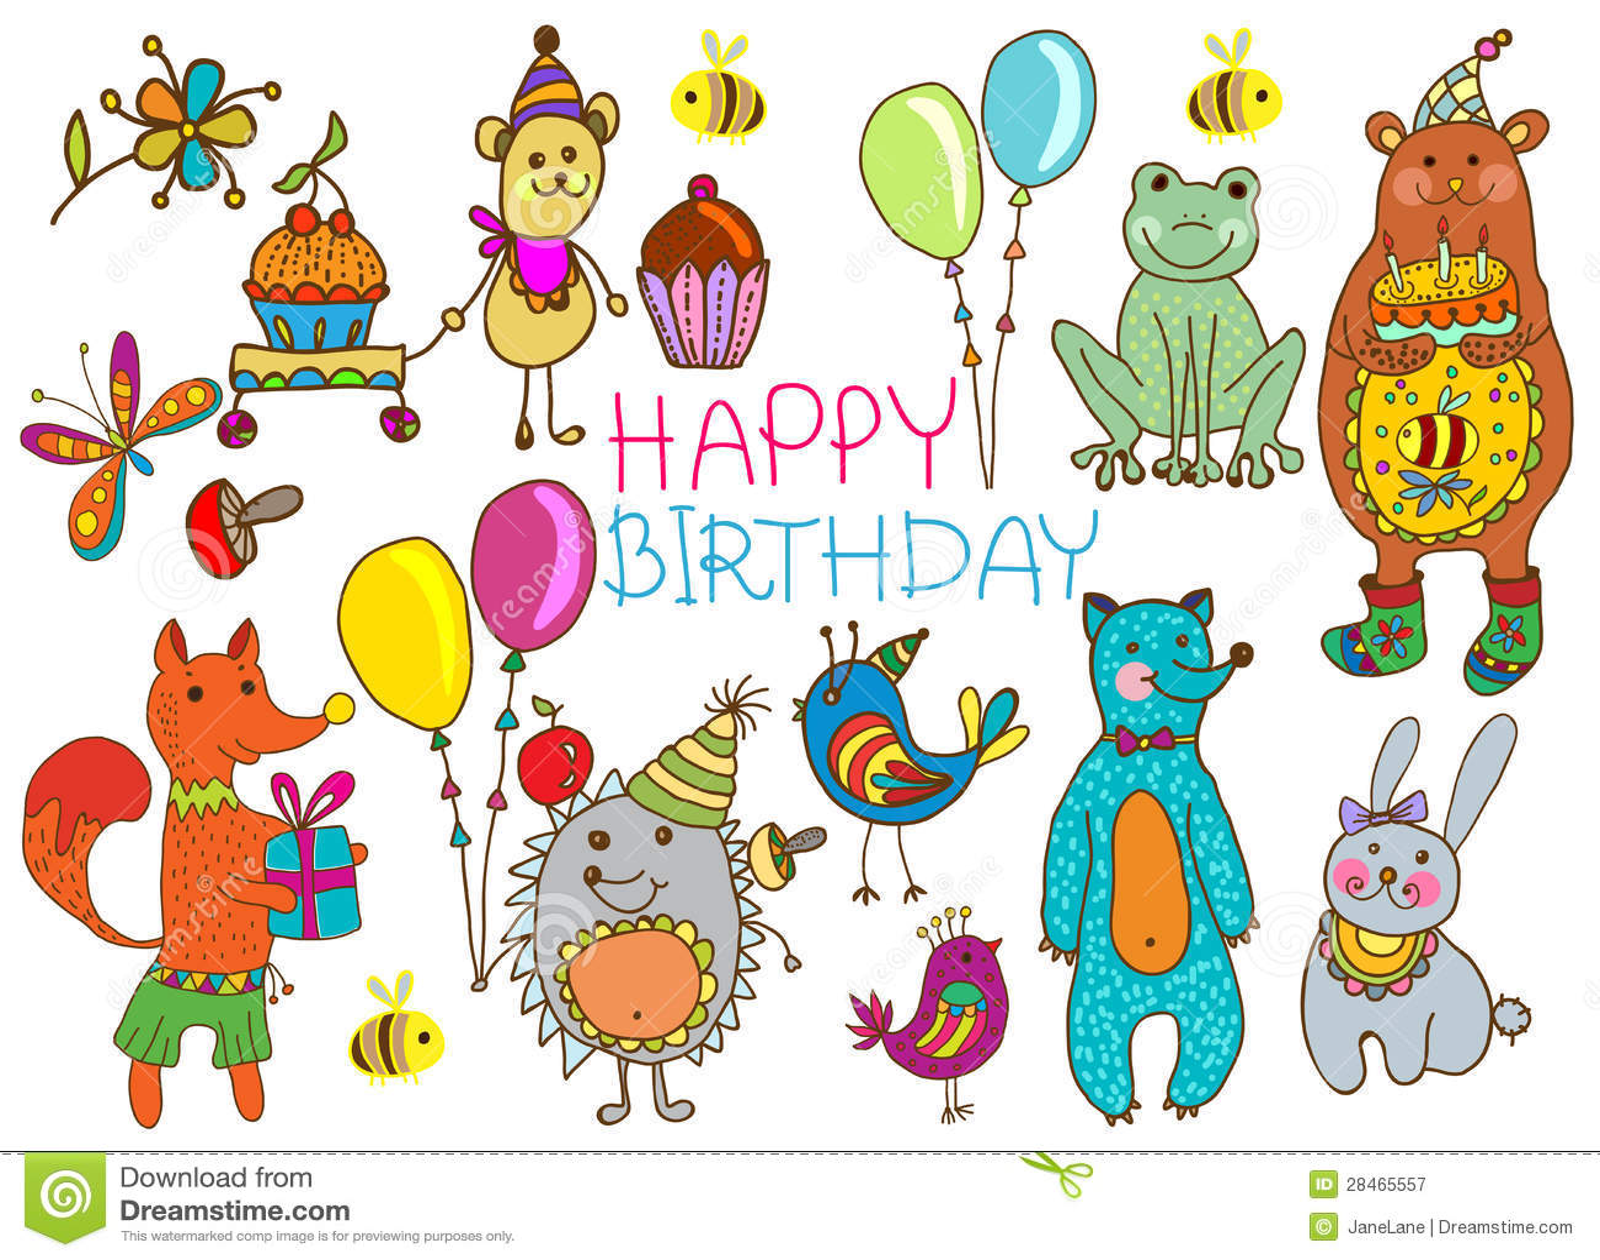 Alles Gute Zum Geburtstagkarikaturkarte Vektor Abbildung